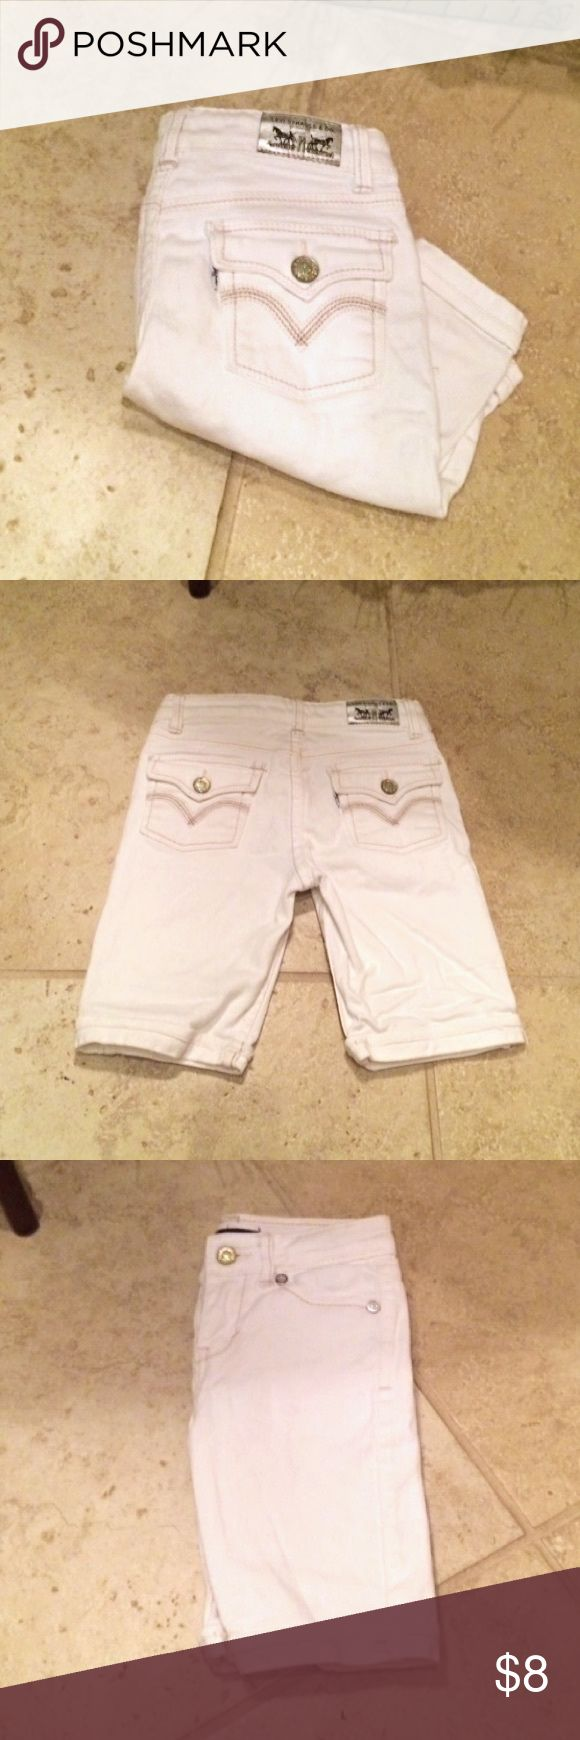 Levis Bermuda Shorts Girls white Levis Bermuda shorts with glitter buttons. Good condition. Adjustable waist. 55% ramie 2% spandex 55% cotton. Levi's Bottoms Shorts